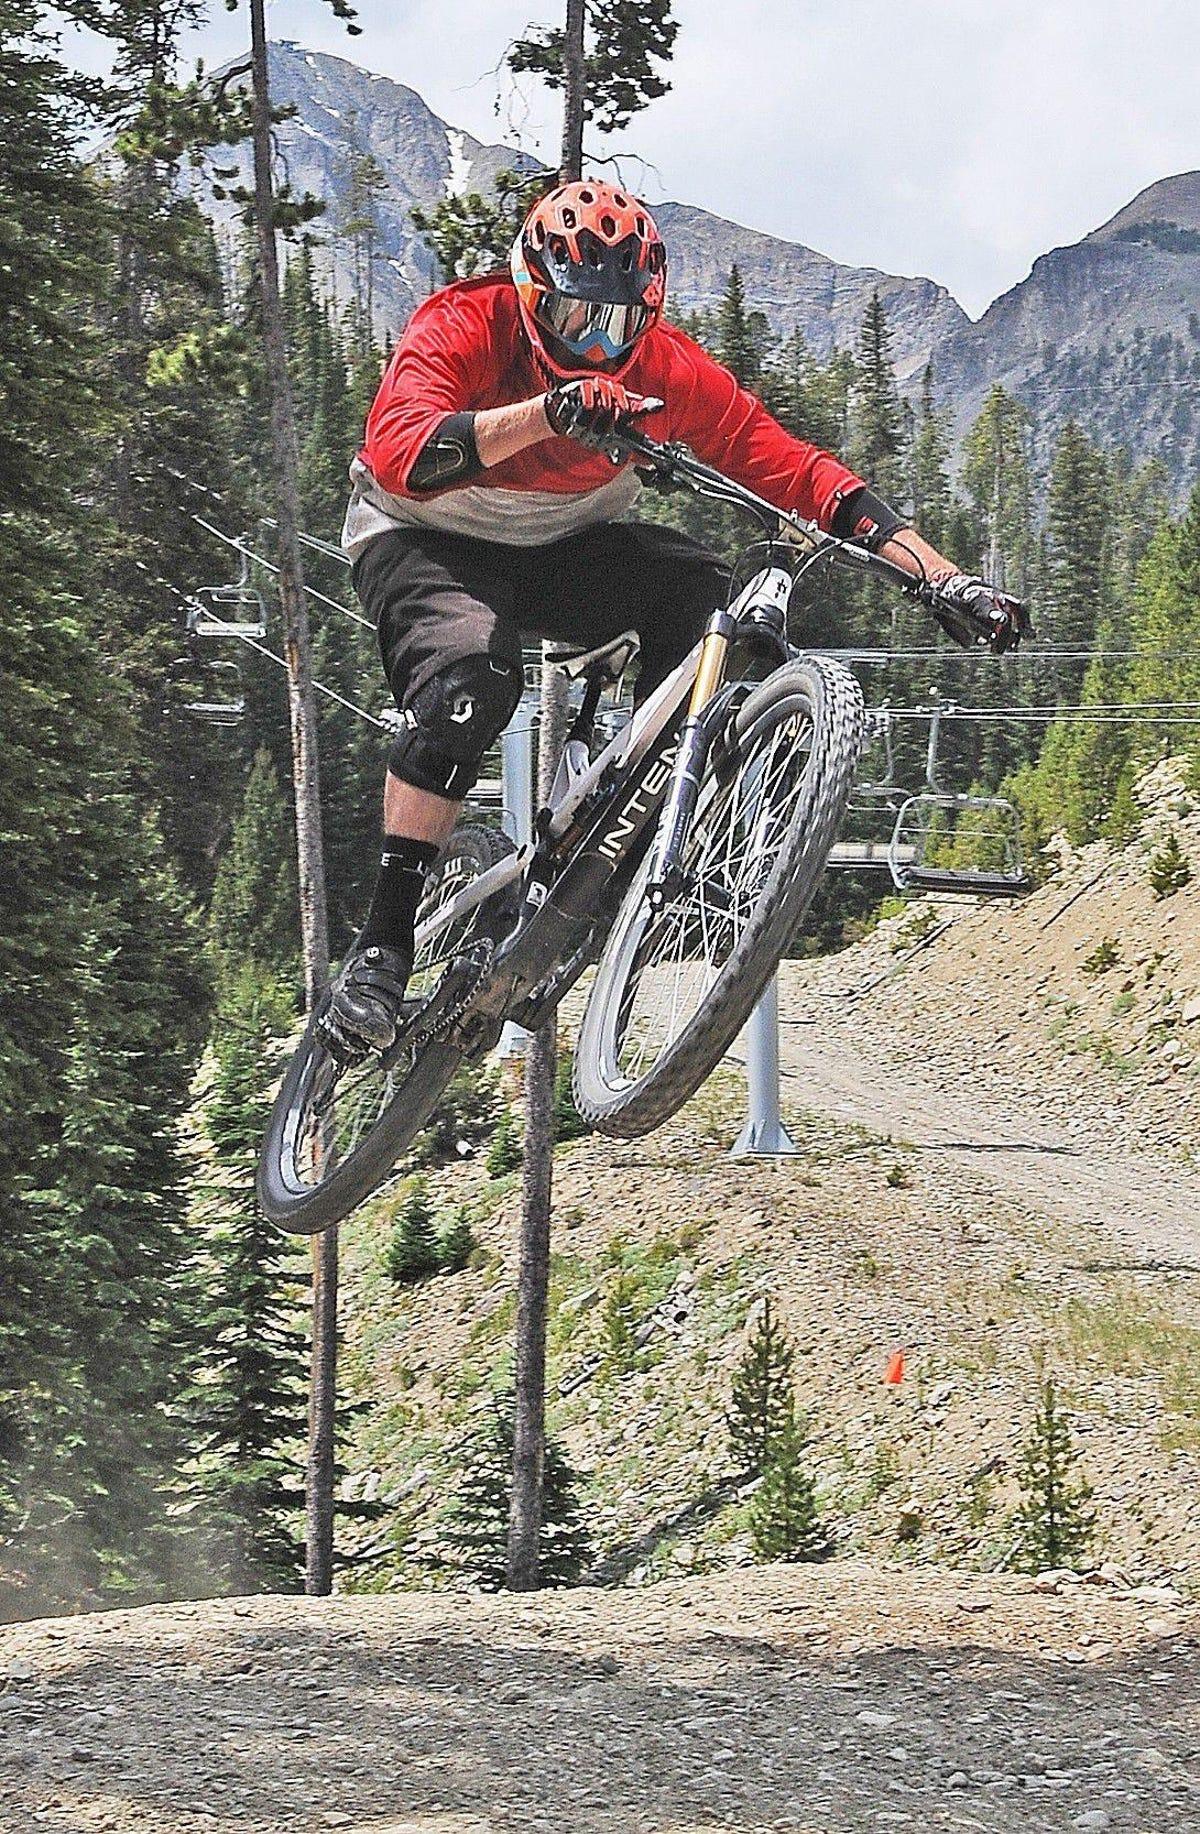 Big Sky Resort's new trails boost mountain biking opportunities